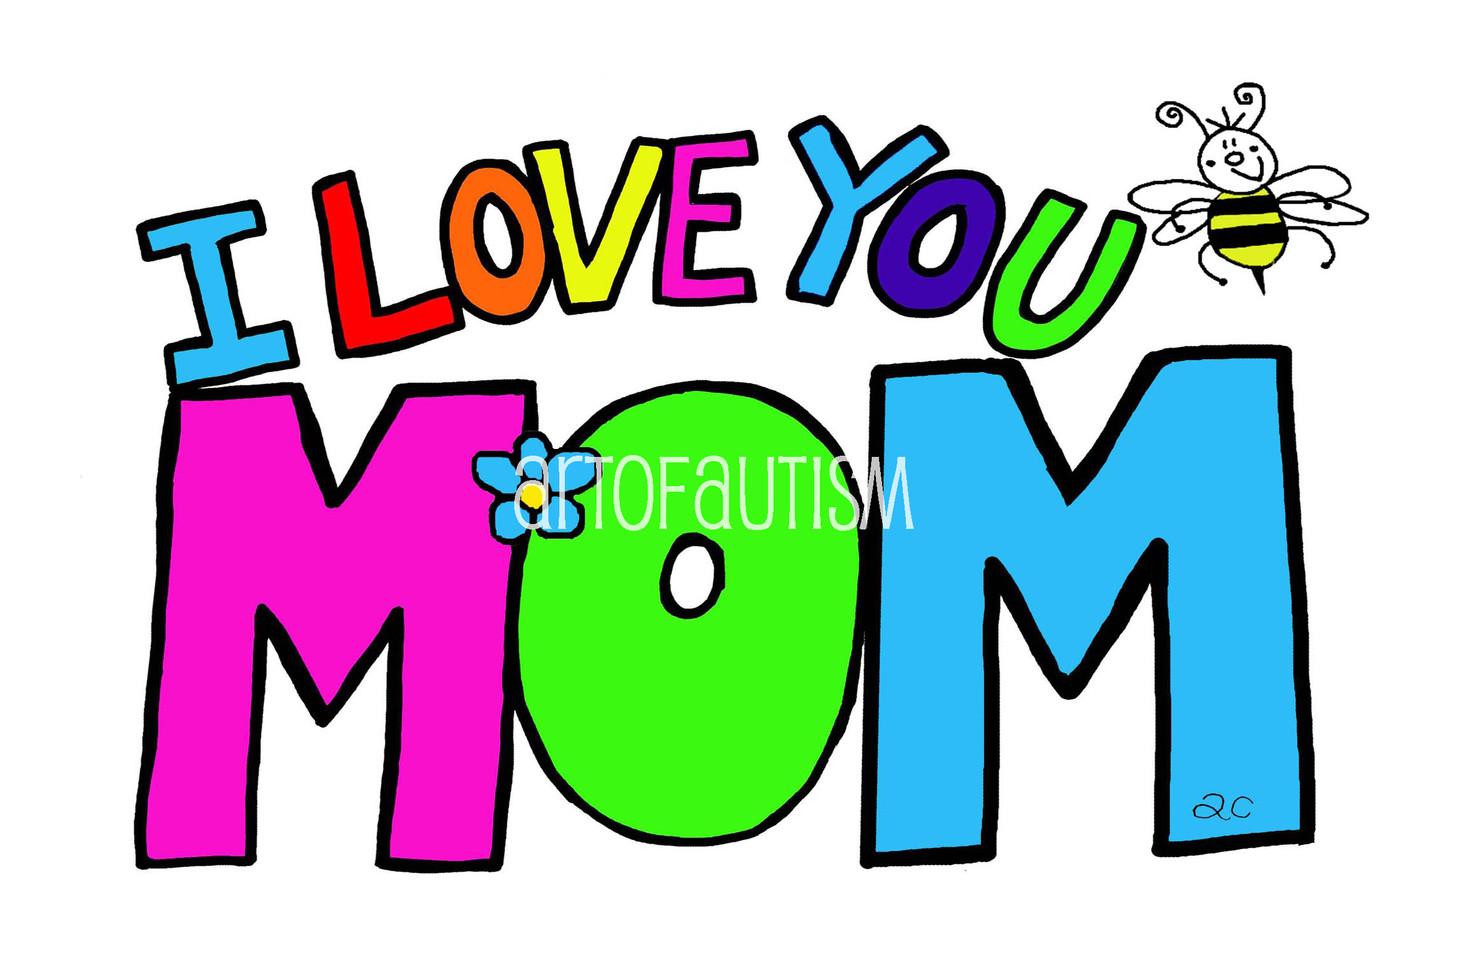 15-012 I Love you MOM